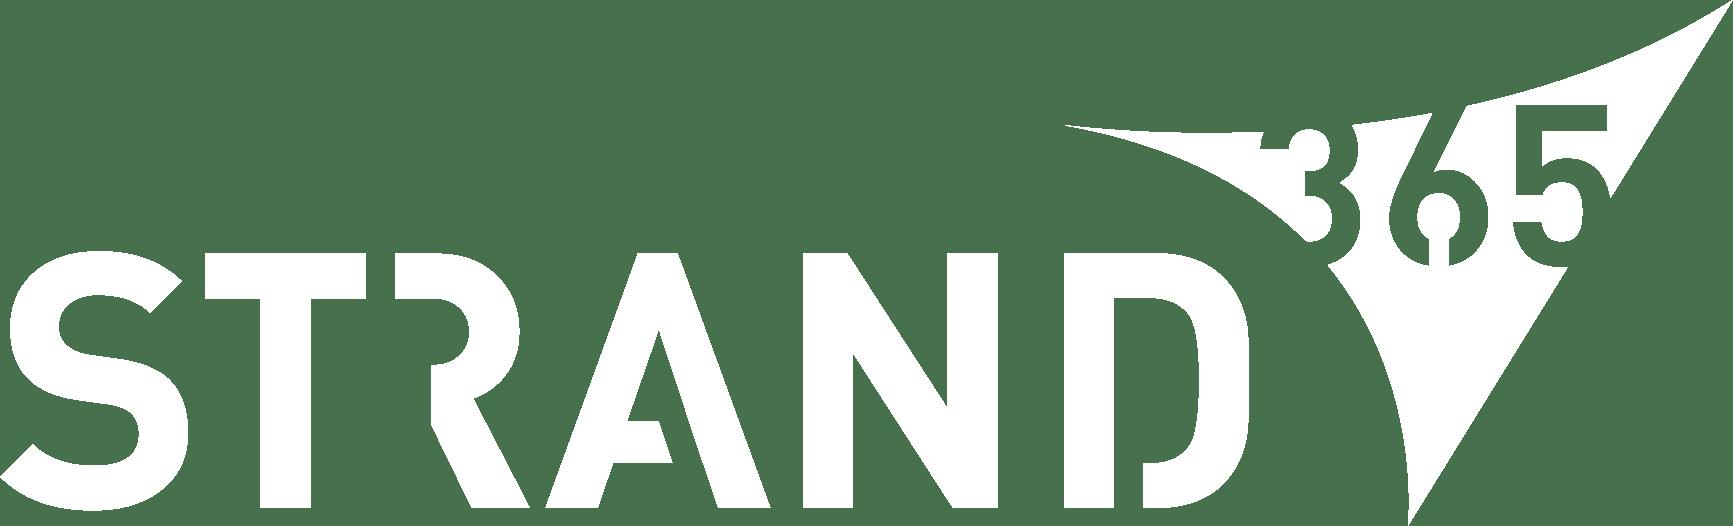 Strand365 Logo